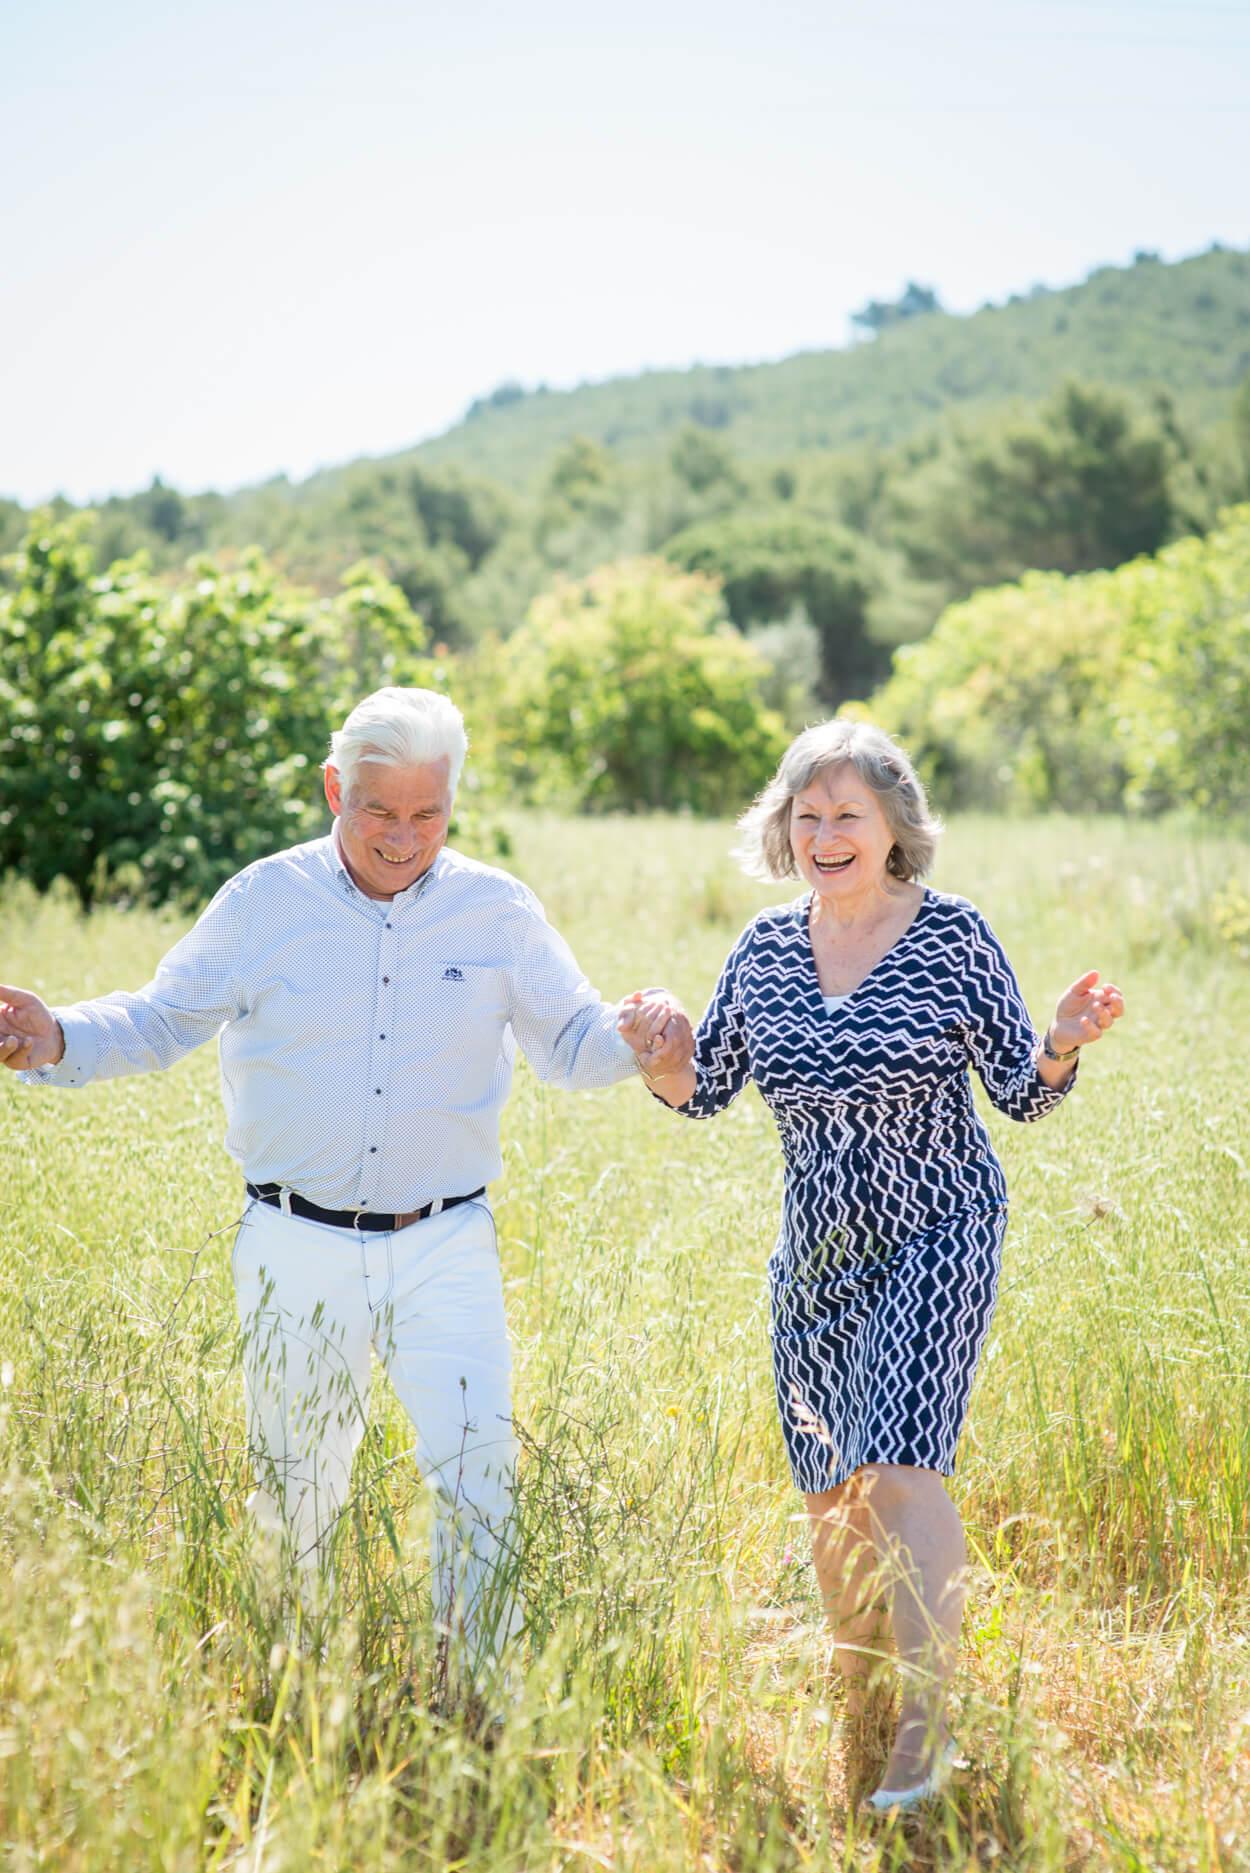 50th wedding anniversary couple portrait happy dancing in field